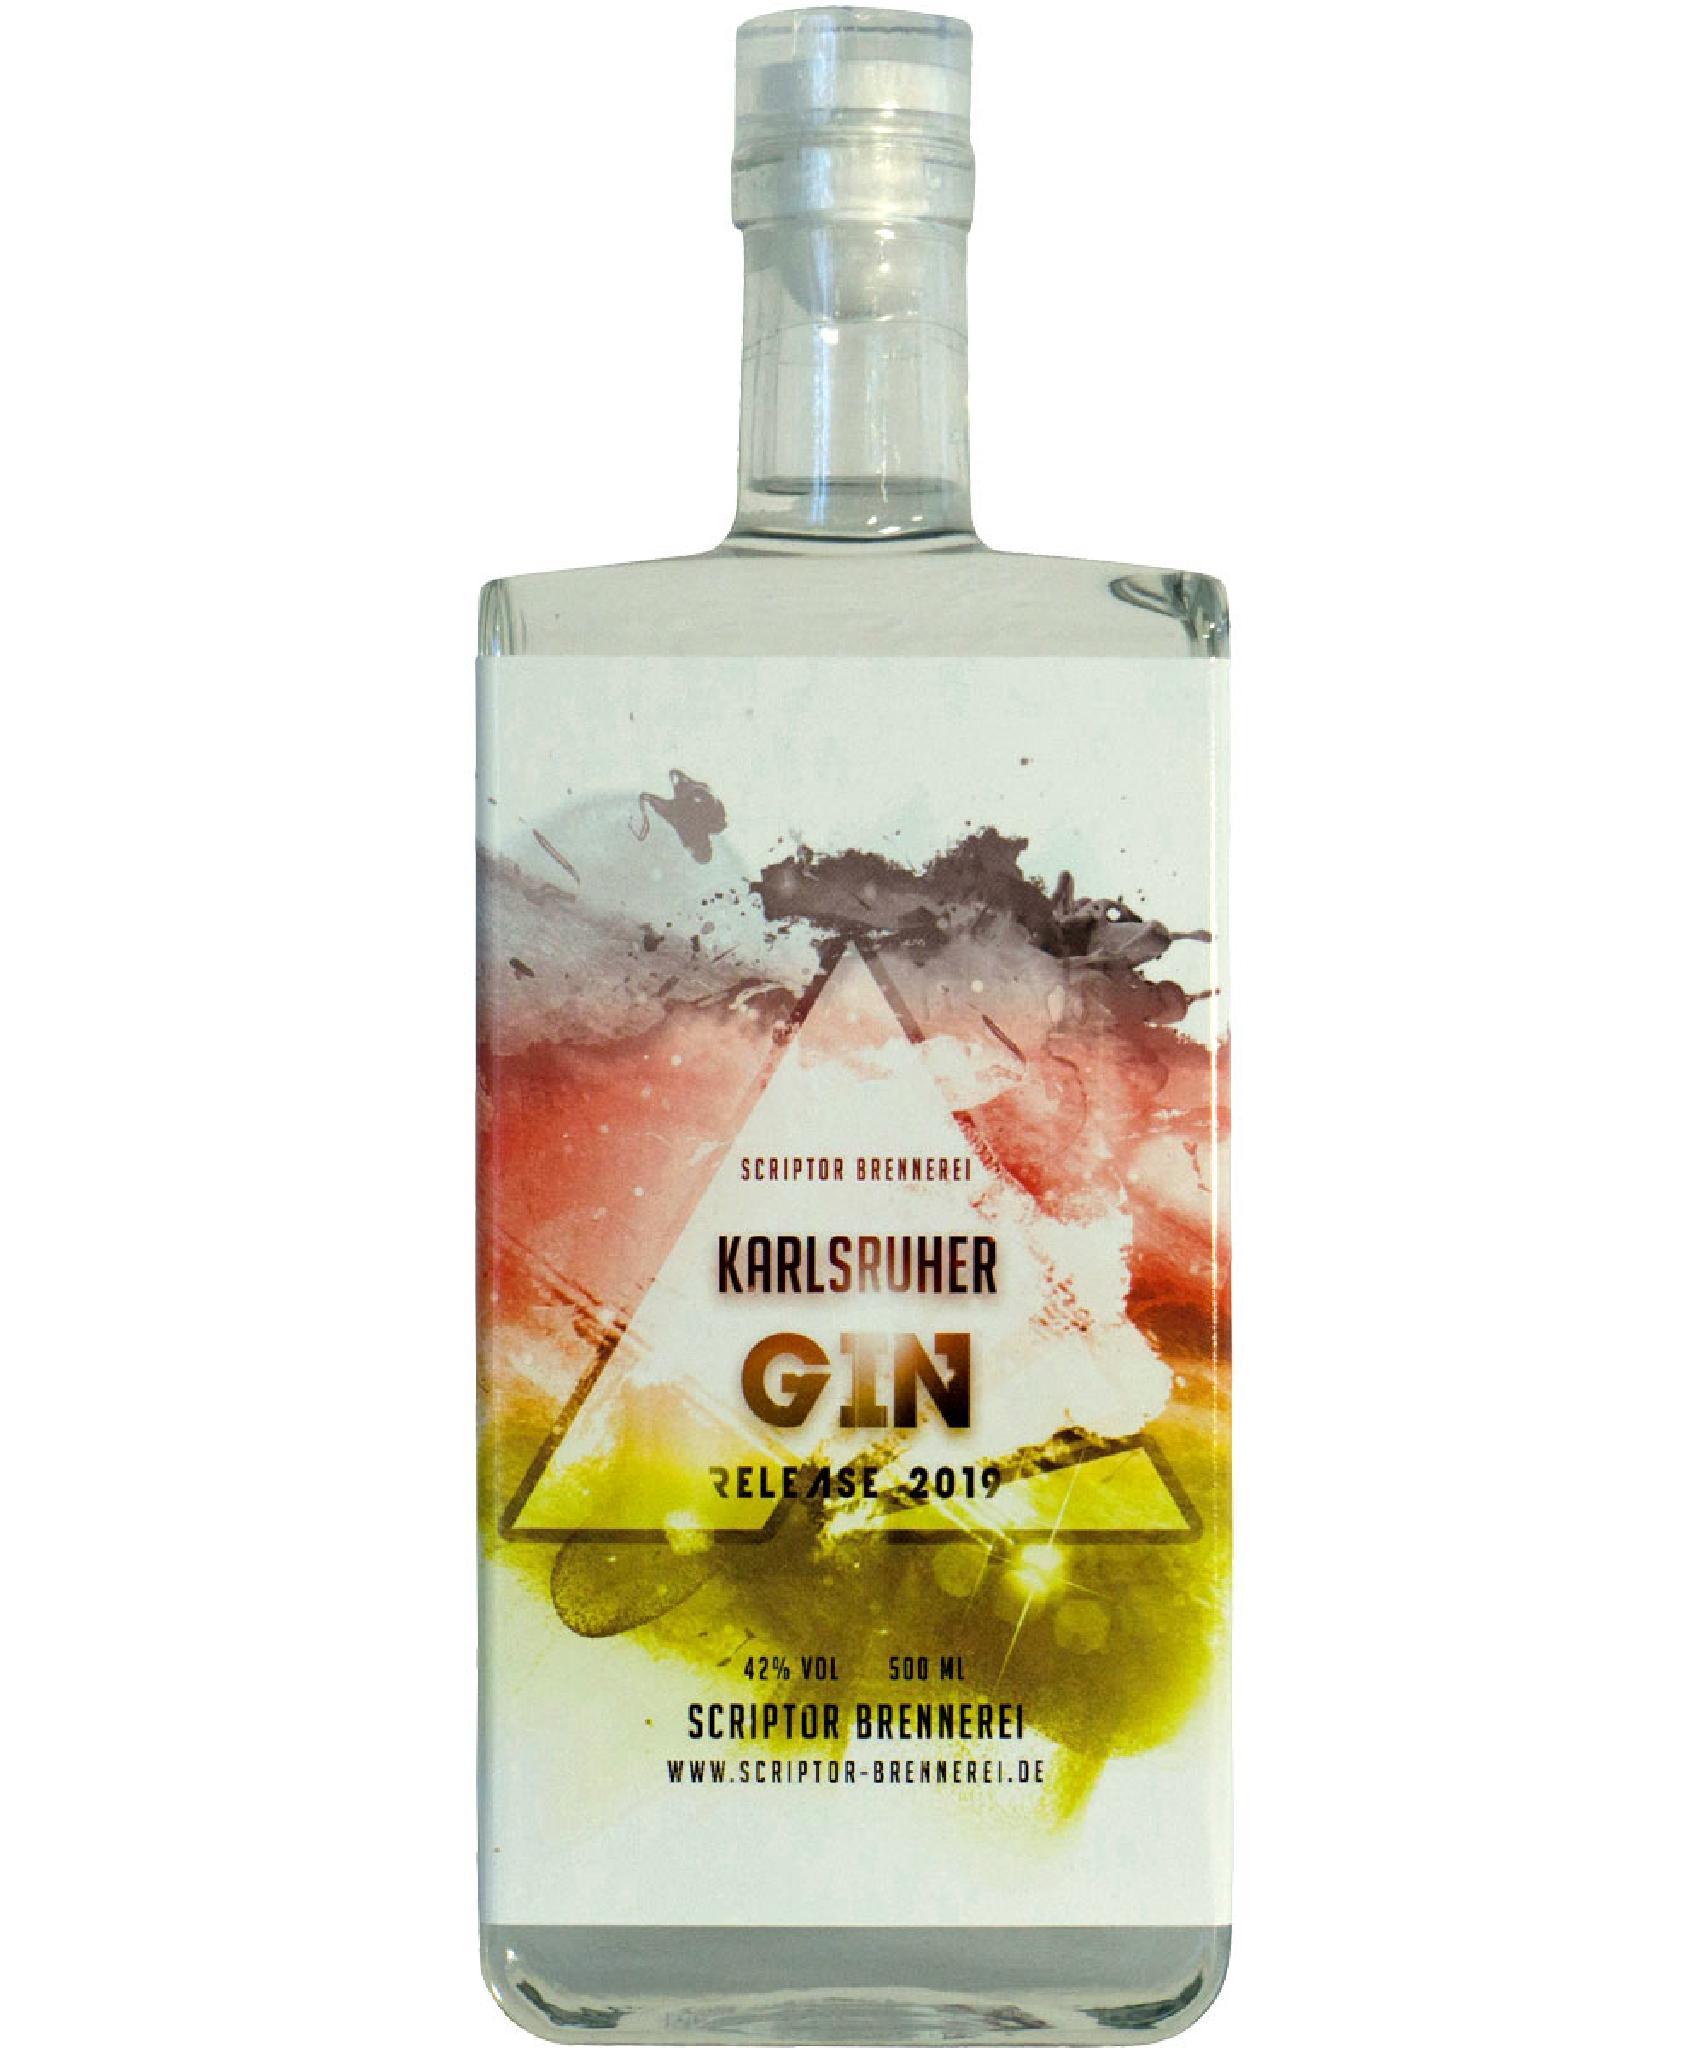 Karlsruher Gin, 42% VOL.